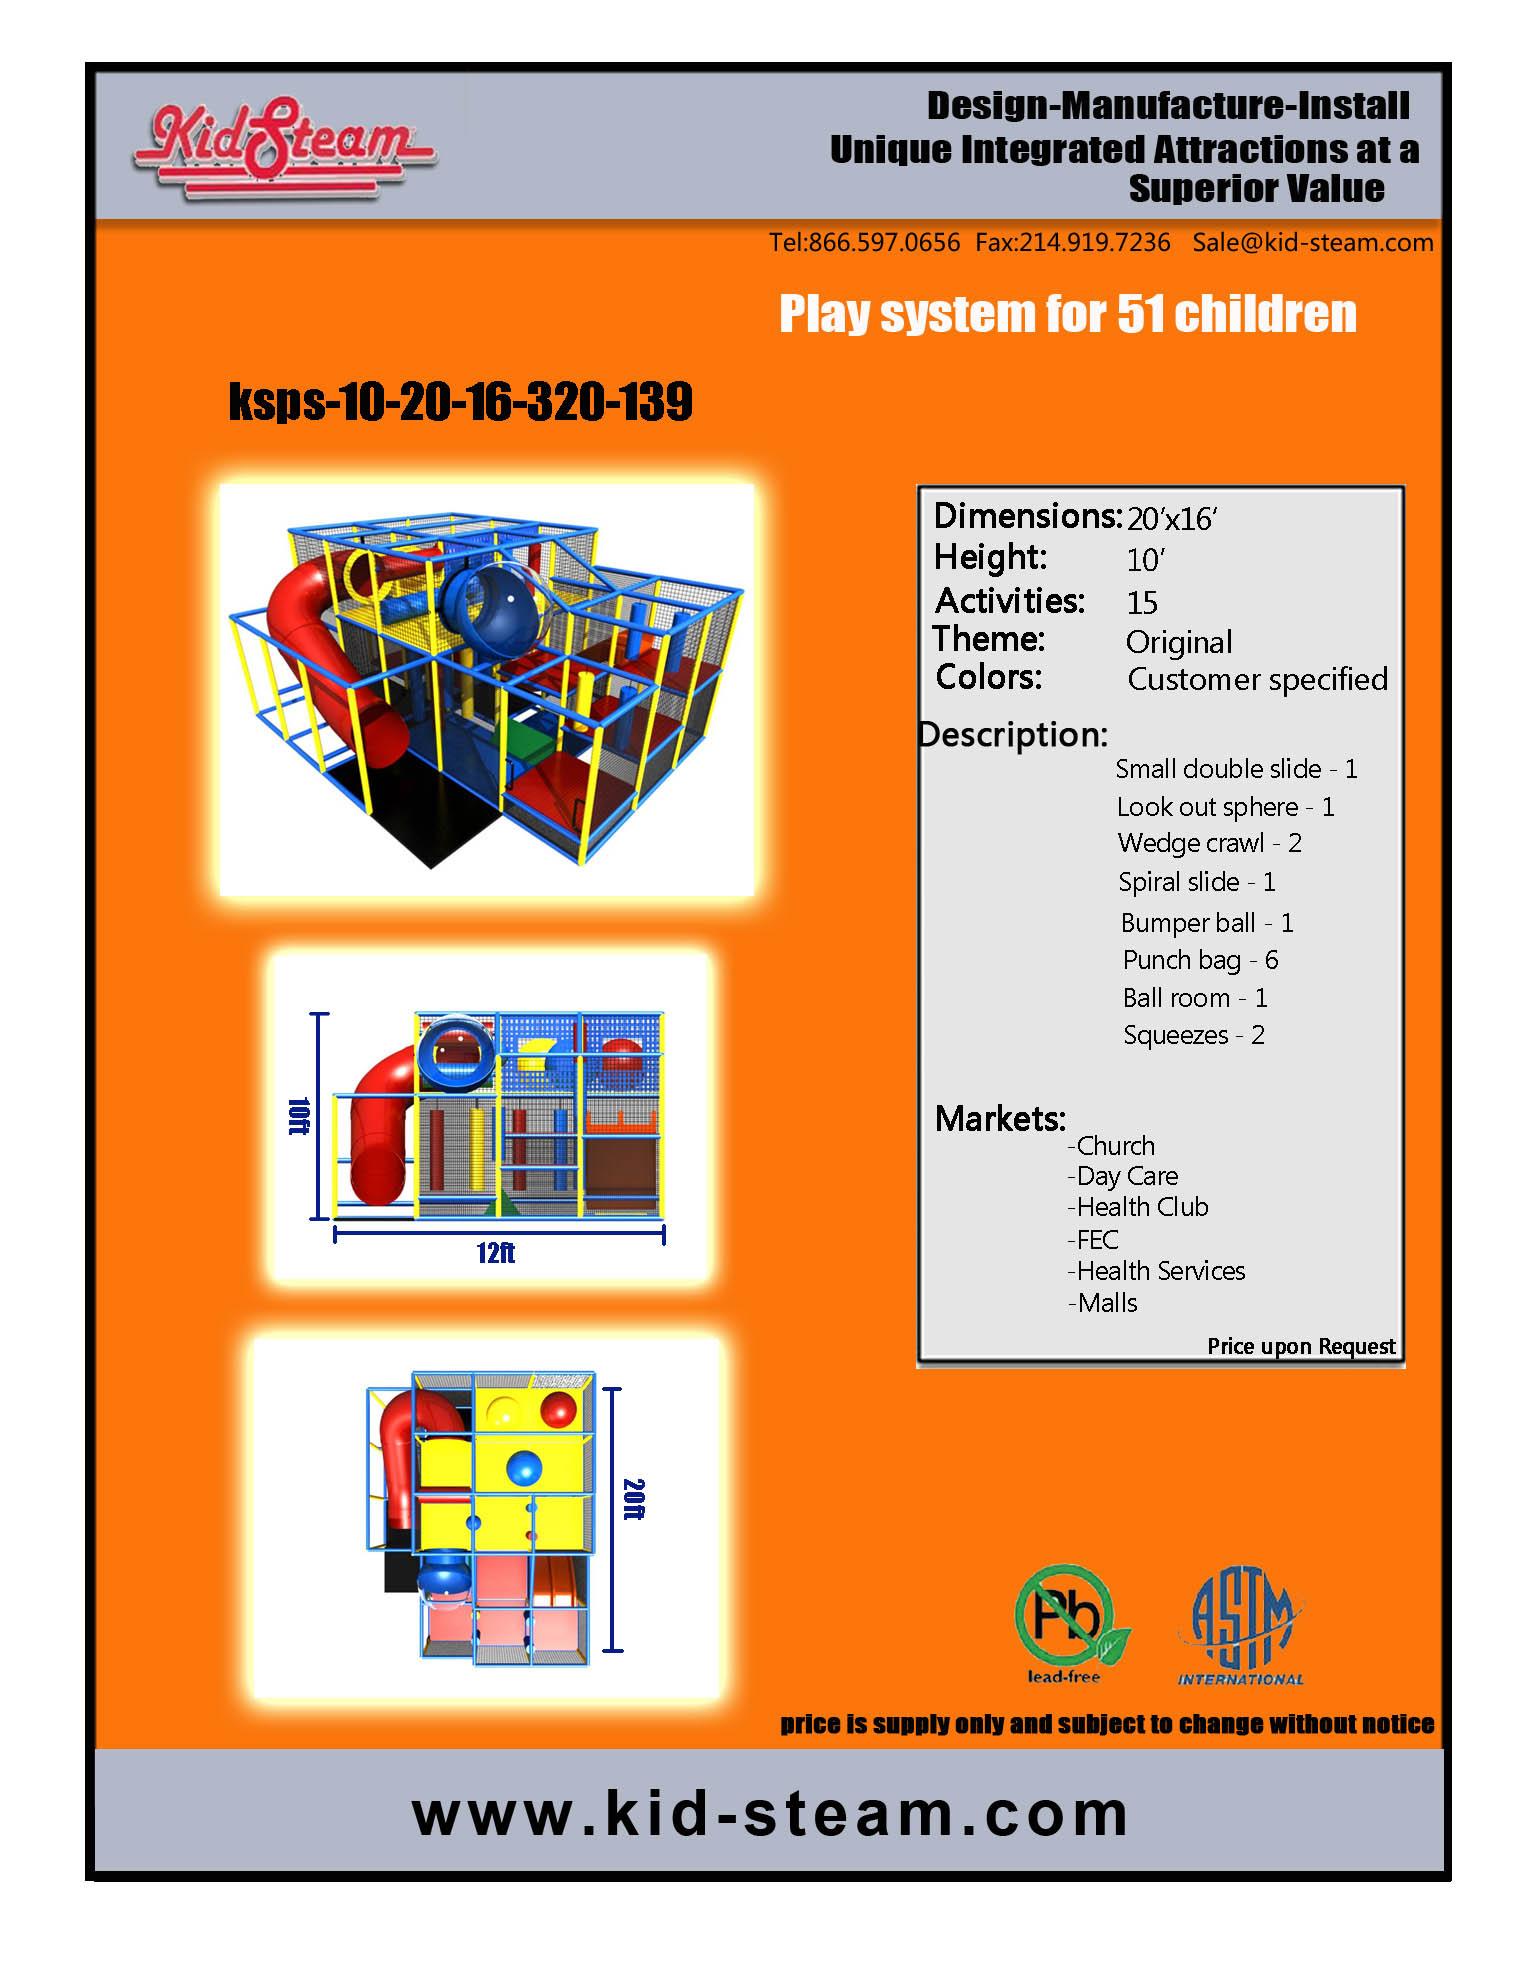 Indoor Playground Design: Budget: $20,000-$32,000 Ages: 3-12